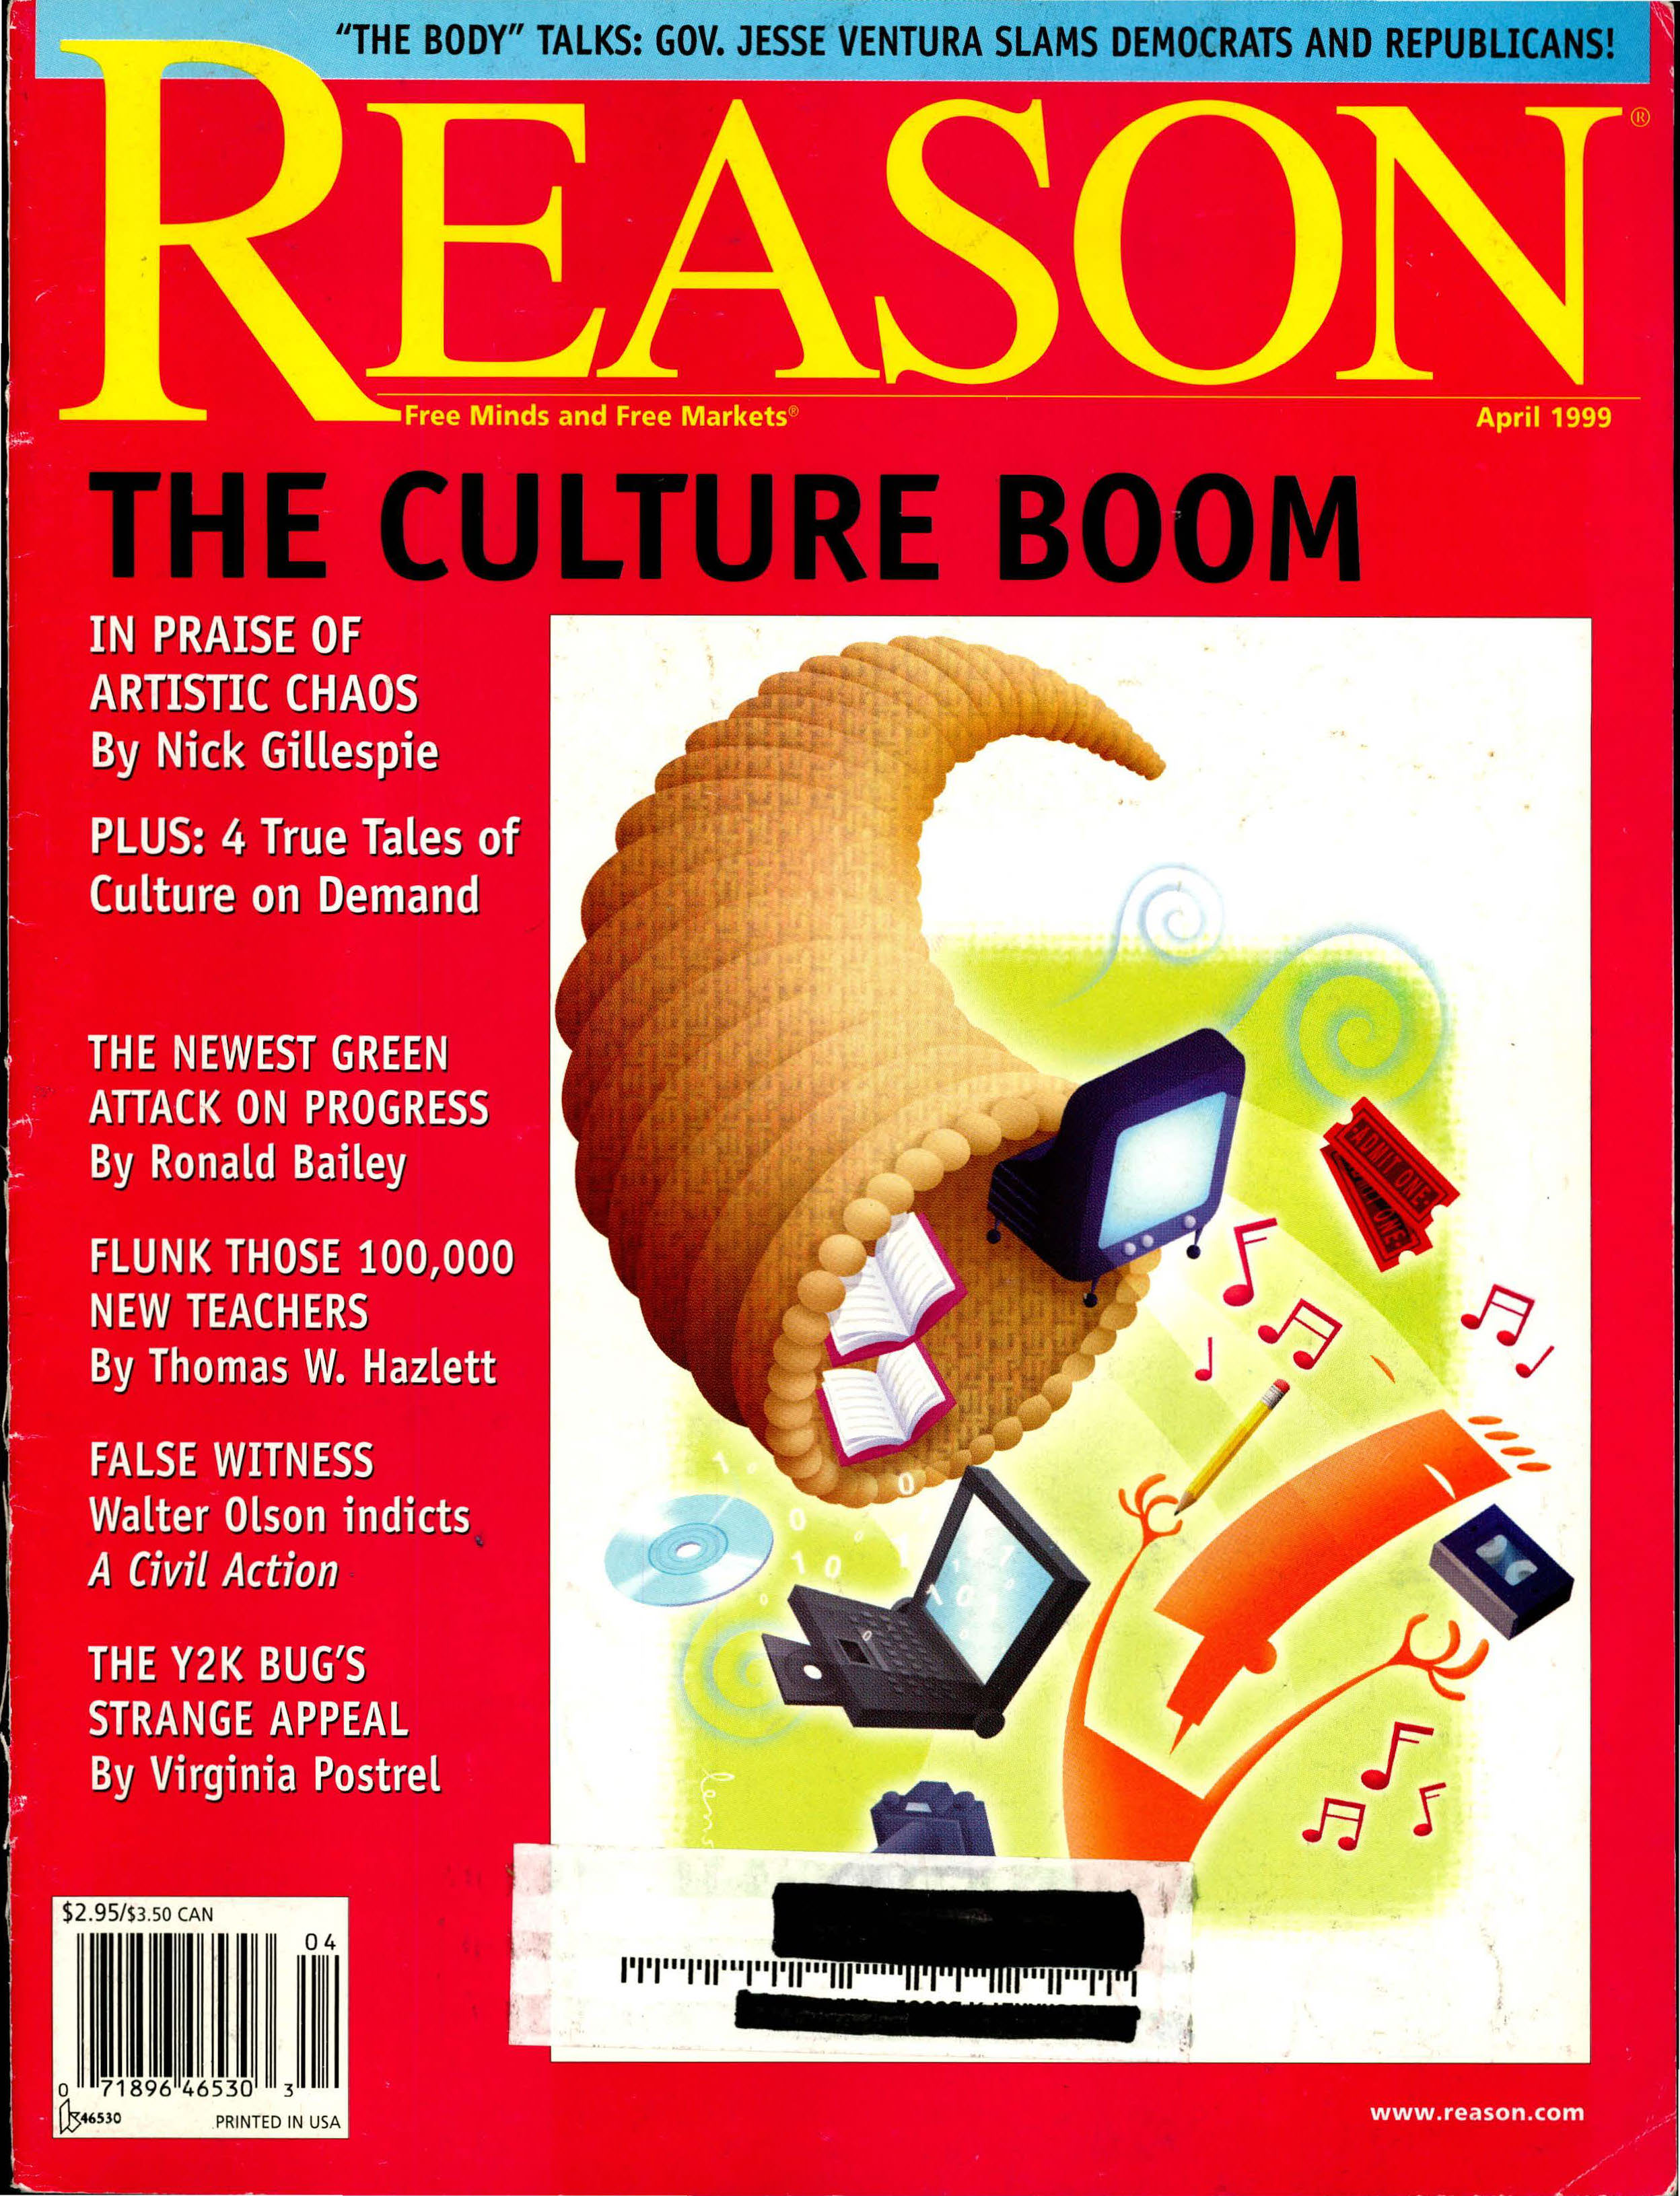 Reason Magazine, April 1999 cover image